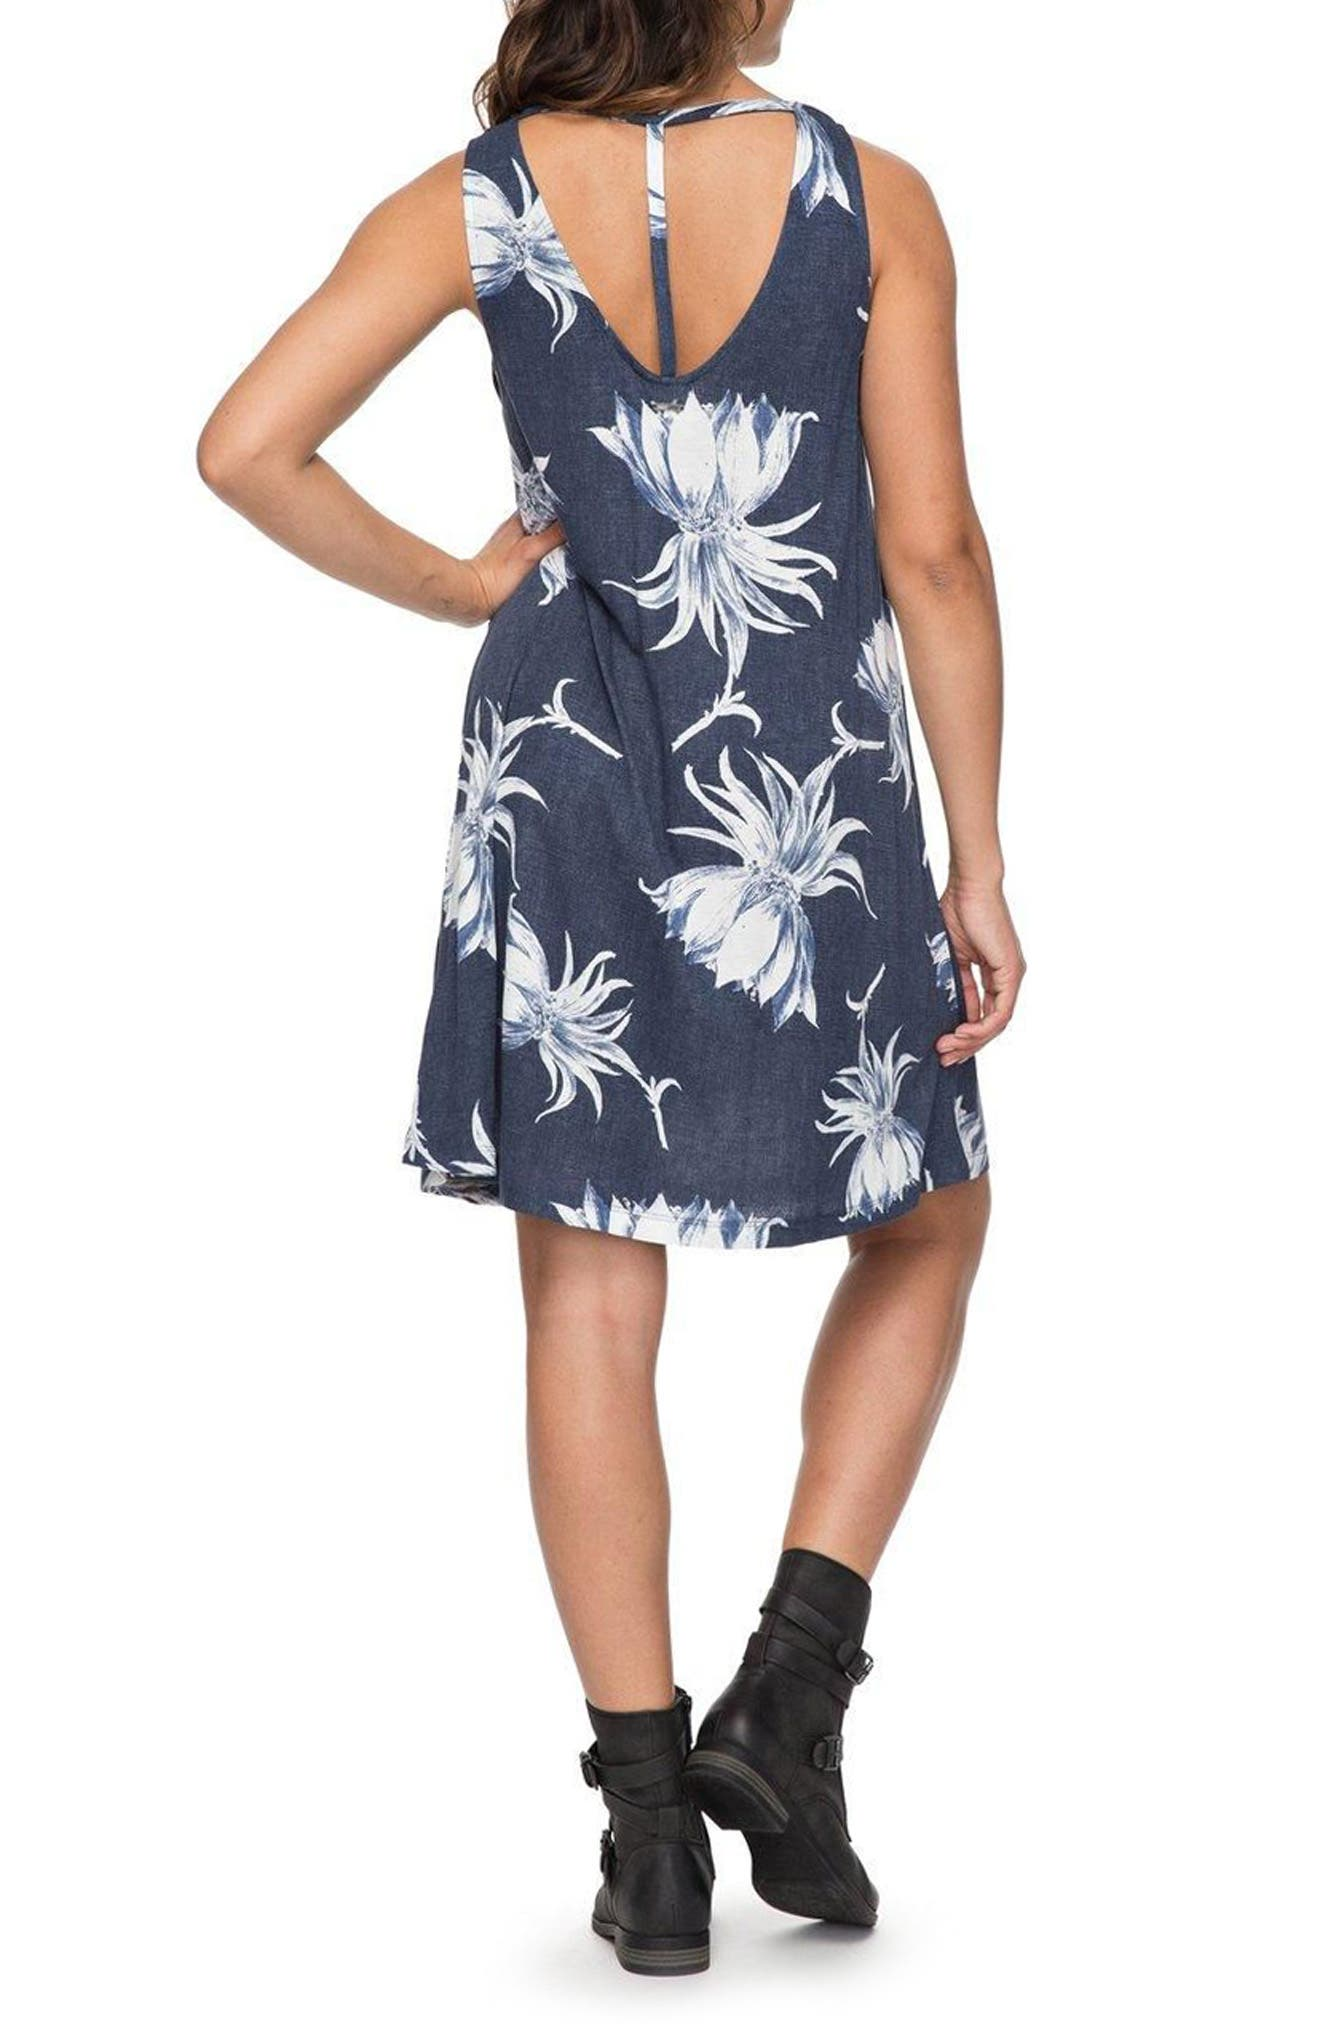 Sugar Space Shift Dress,                             Alternate thumbnail 2, color,                             Dress Blue Cadaques Flower